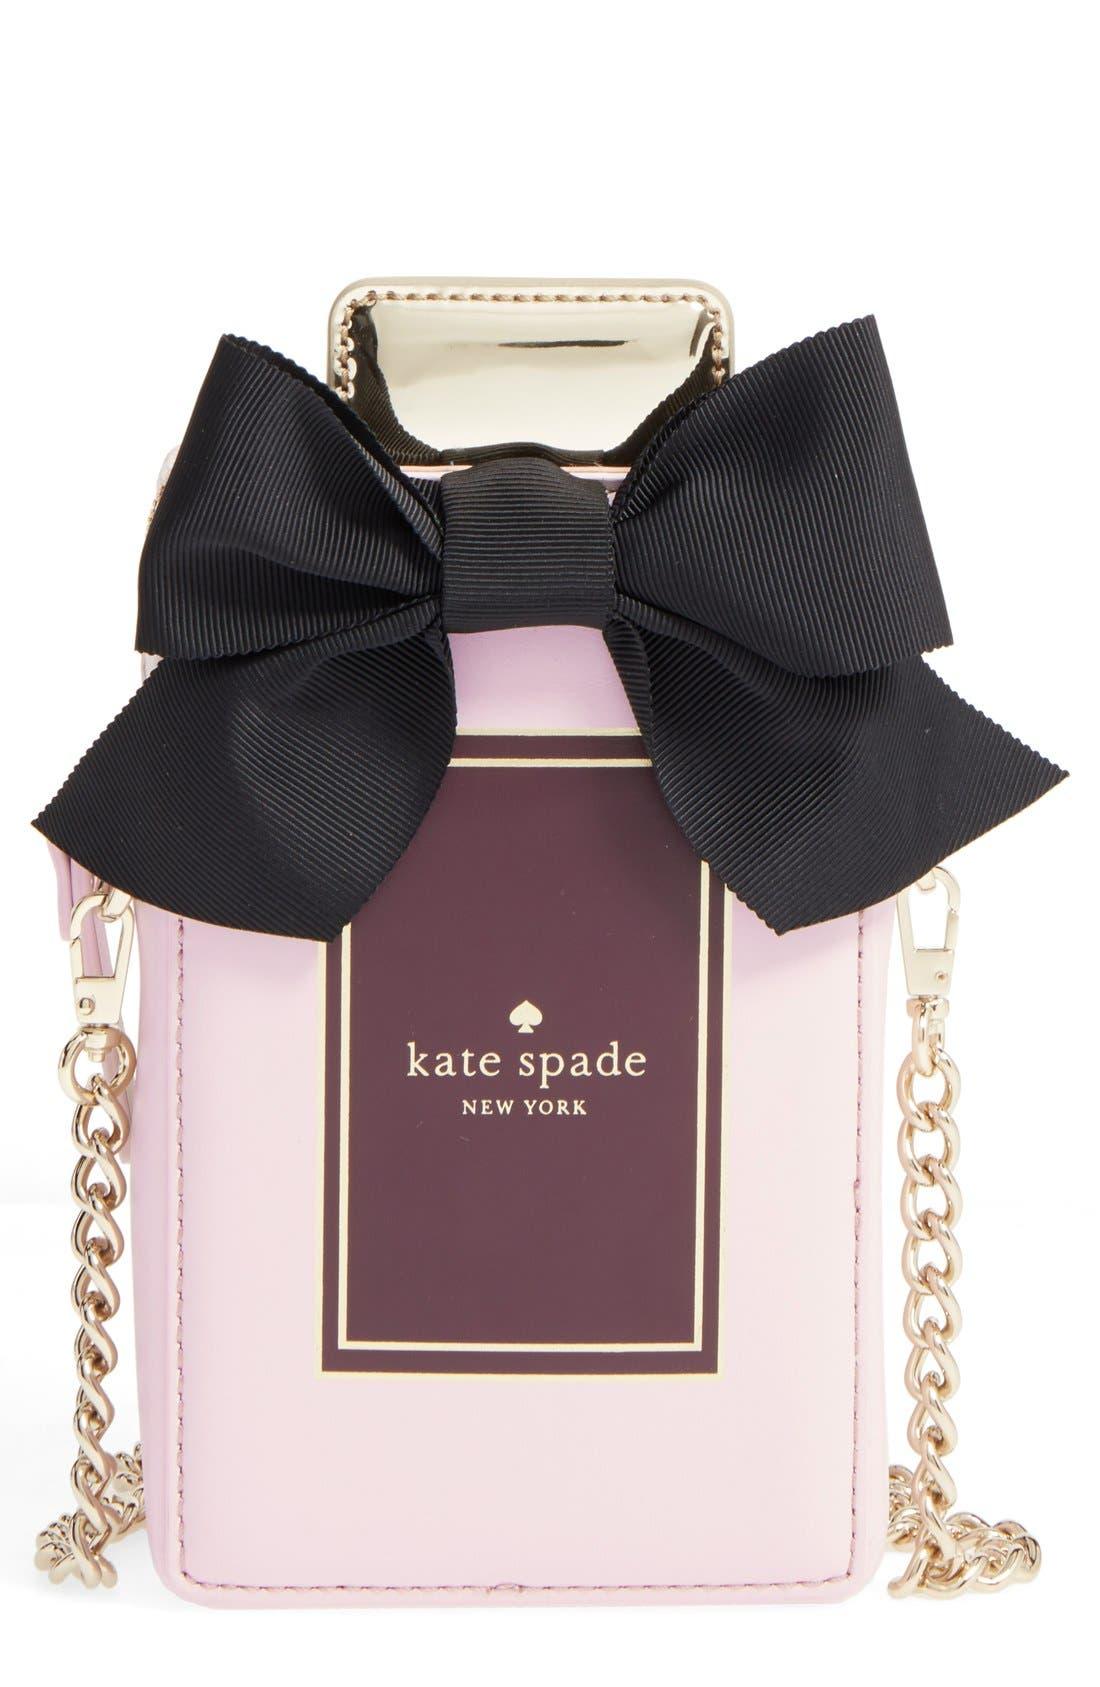 Alternate Image 1 Selected - kate spade new york 'on pointe - perfume bottle' leather crossbody bag